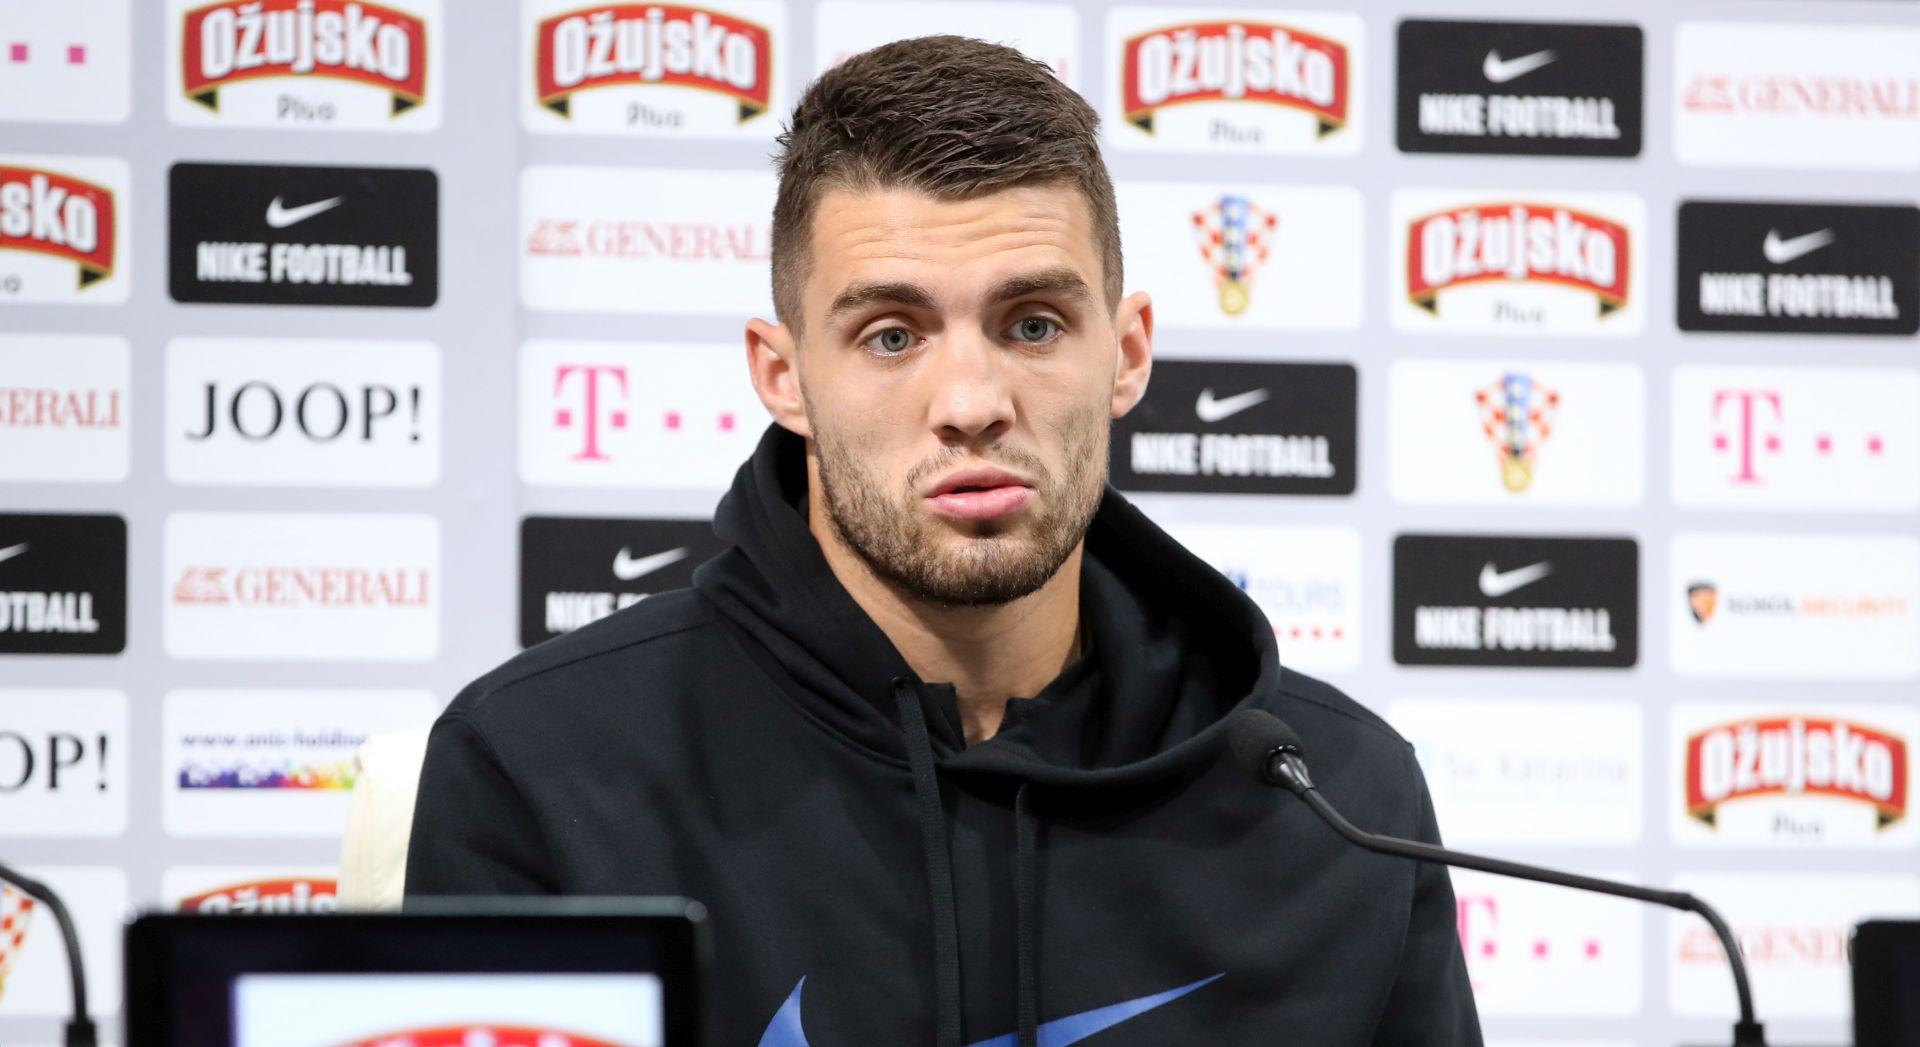 REKORDNI TRANSFER Kovačić potpisao za Chelsea